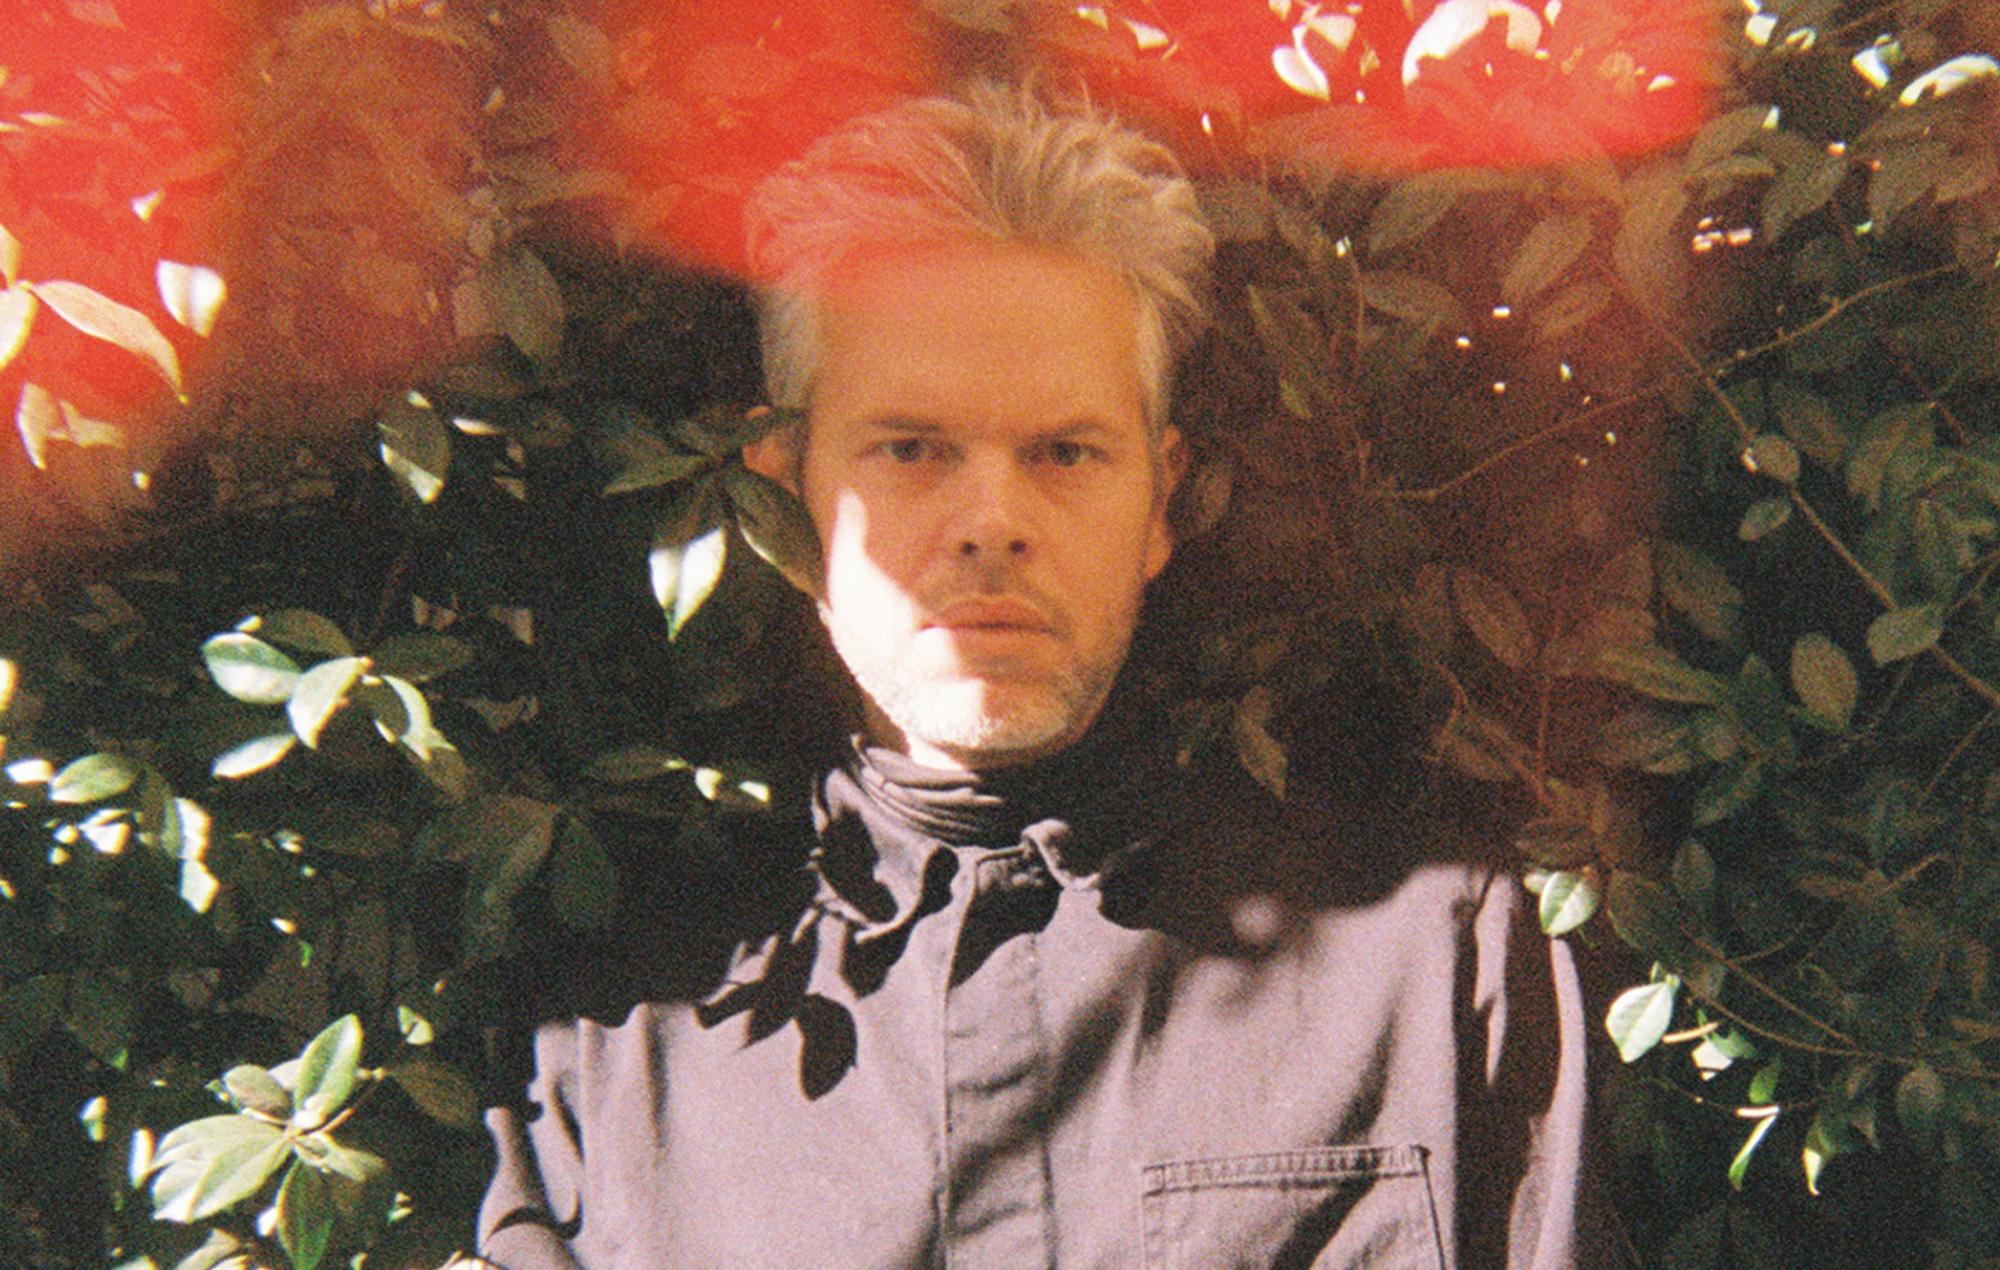 Holiday Sidewinder Nick Littlemore PNAU Empire of the Sun album Face of God 2021 interview